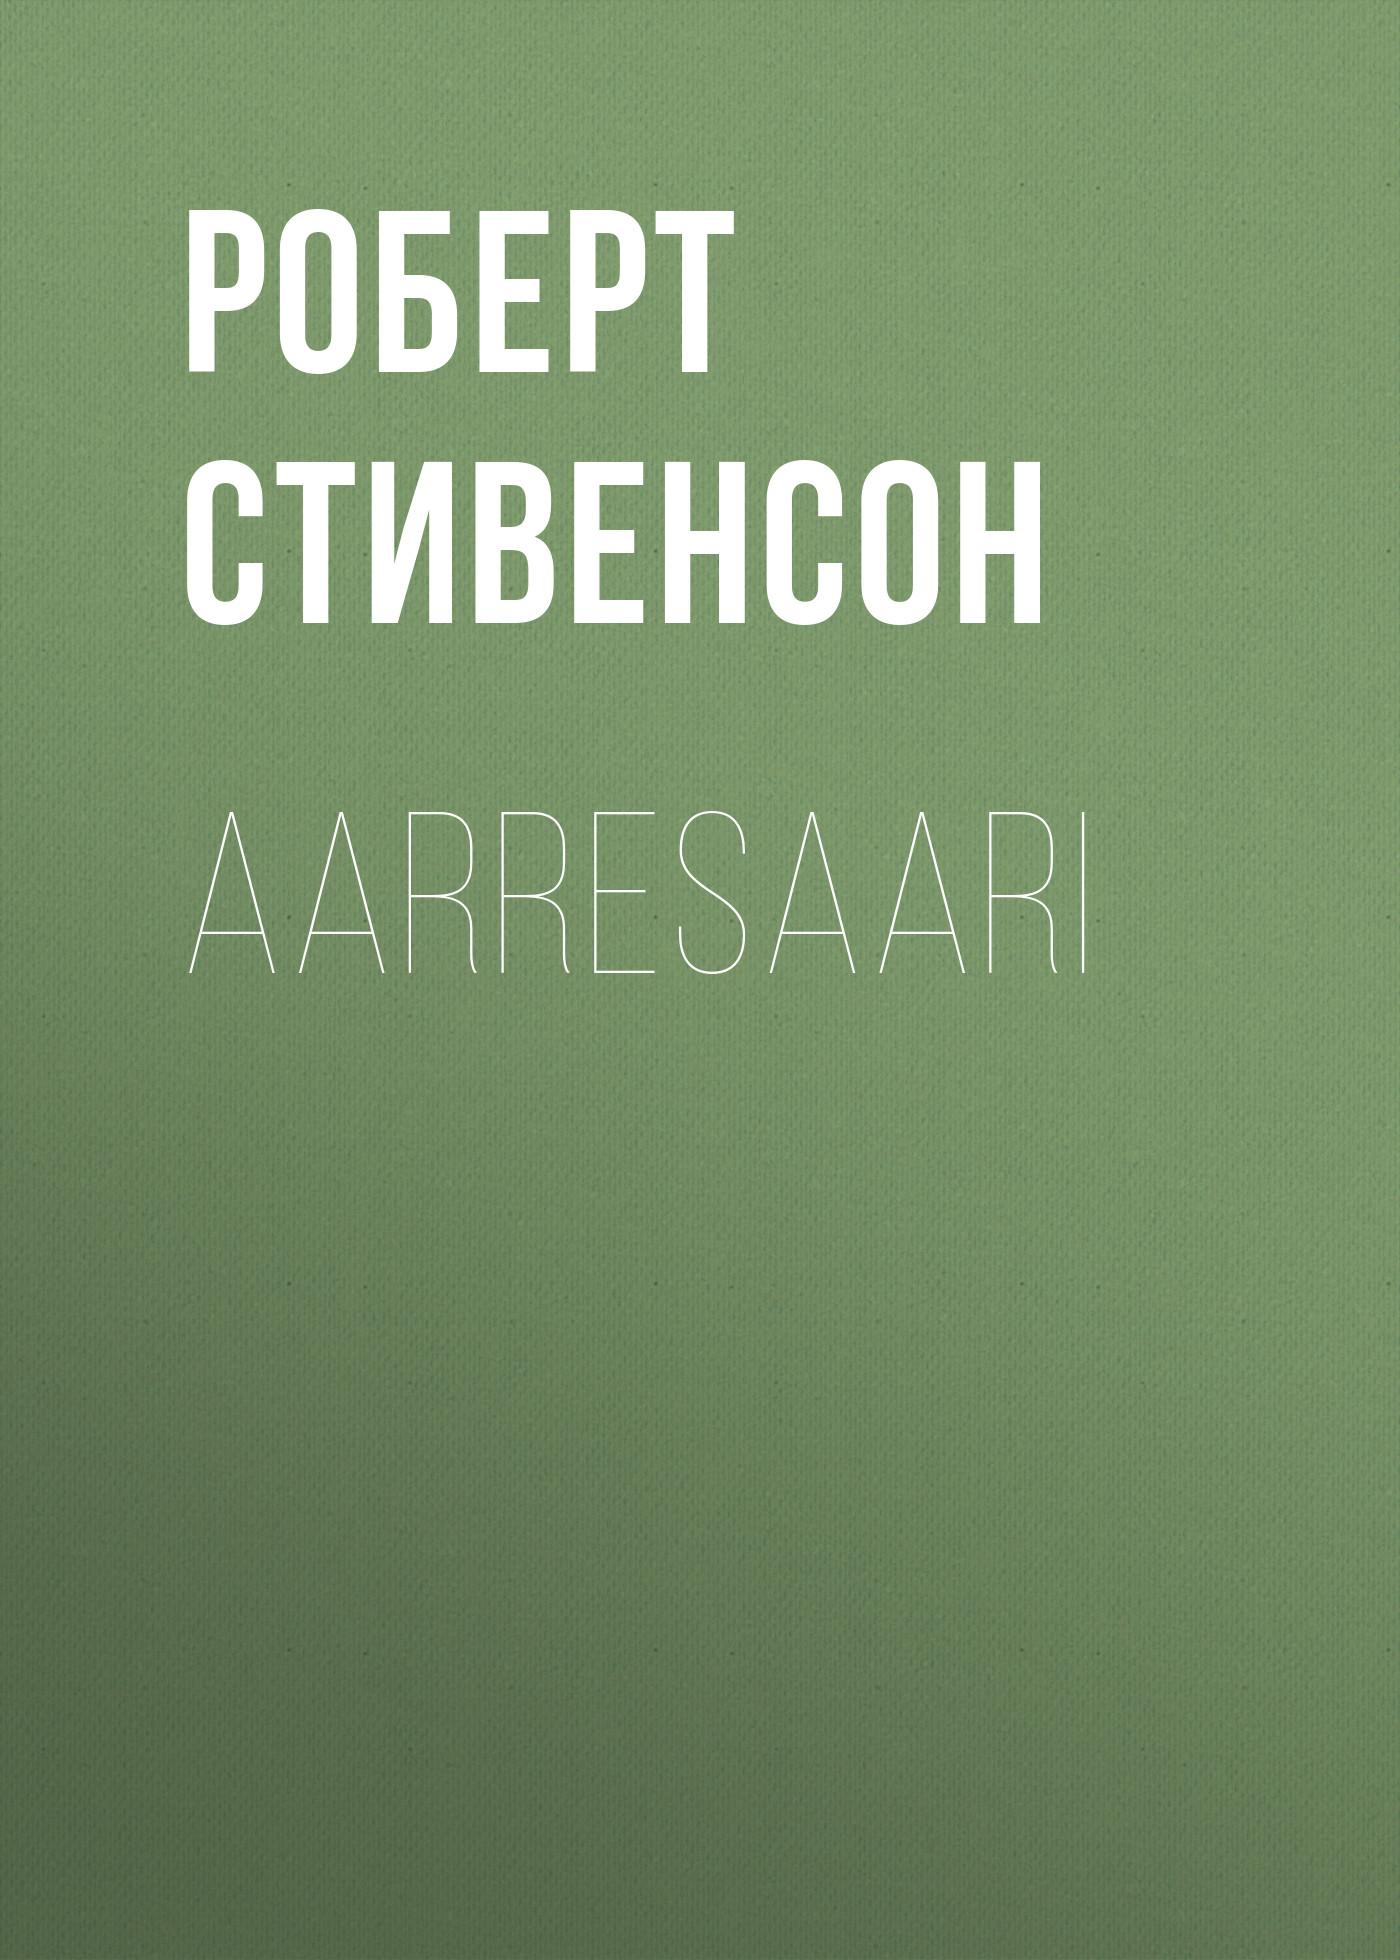 Роберт Льюис Стивенсон Aarresaari роберт льюис стивенсон tales and fantasies